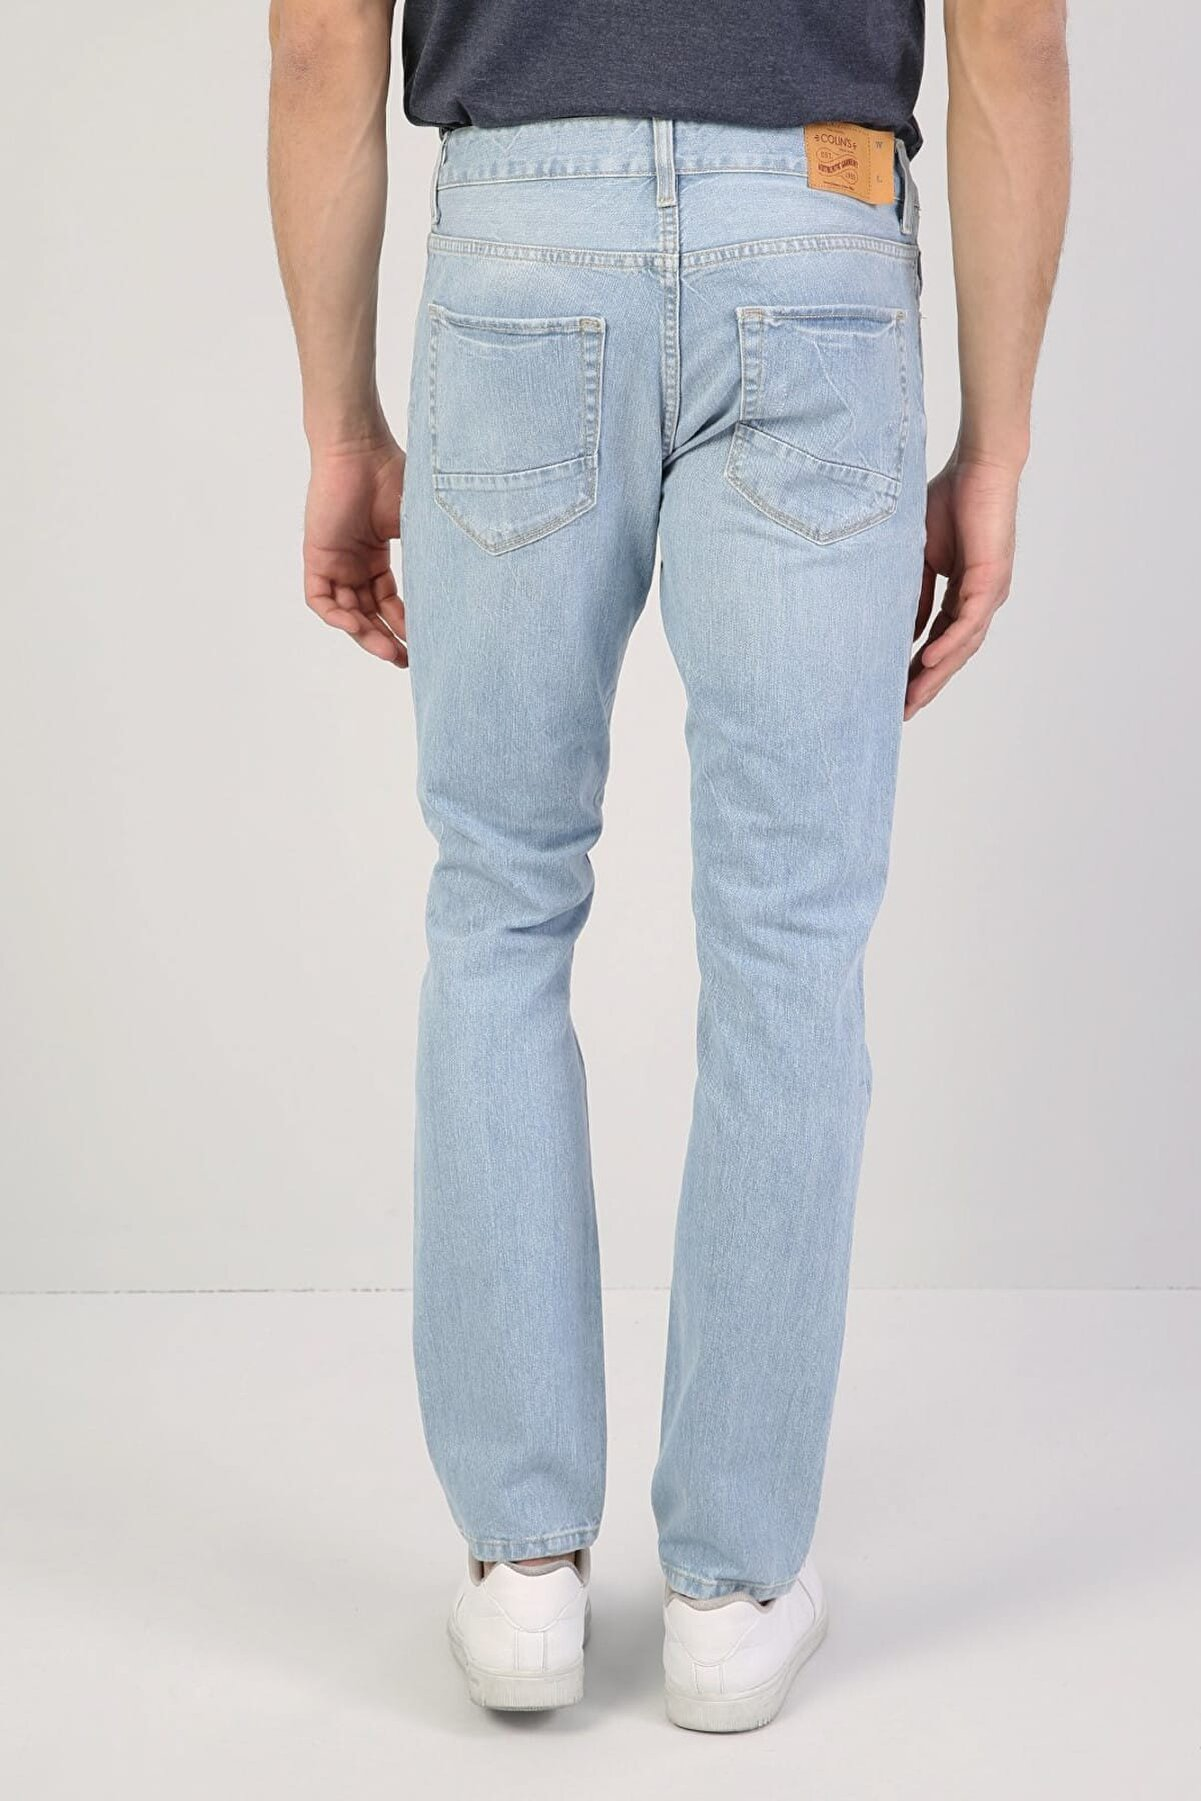 Colin's ERKEK 044 Karl Düşük Bel Düz Paça Straight Fit Mavi Erkek Jean Pantolon CL1036445